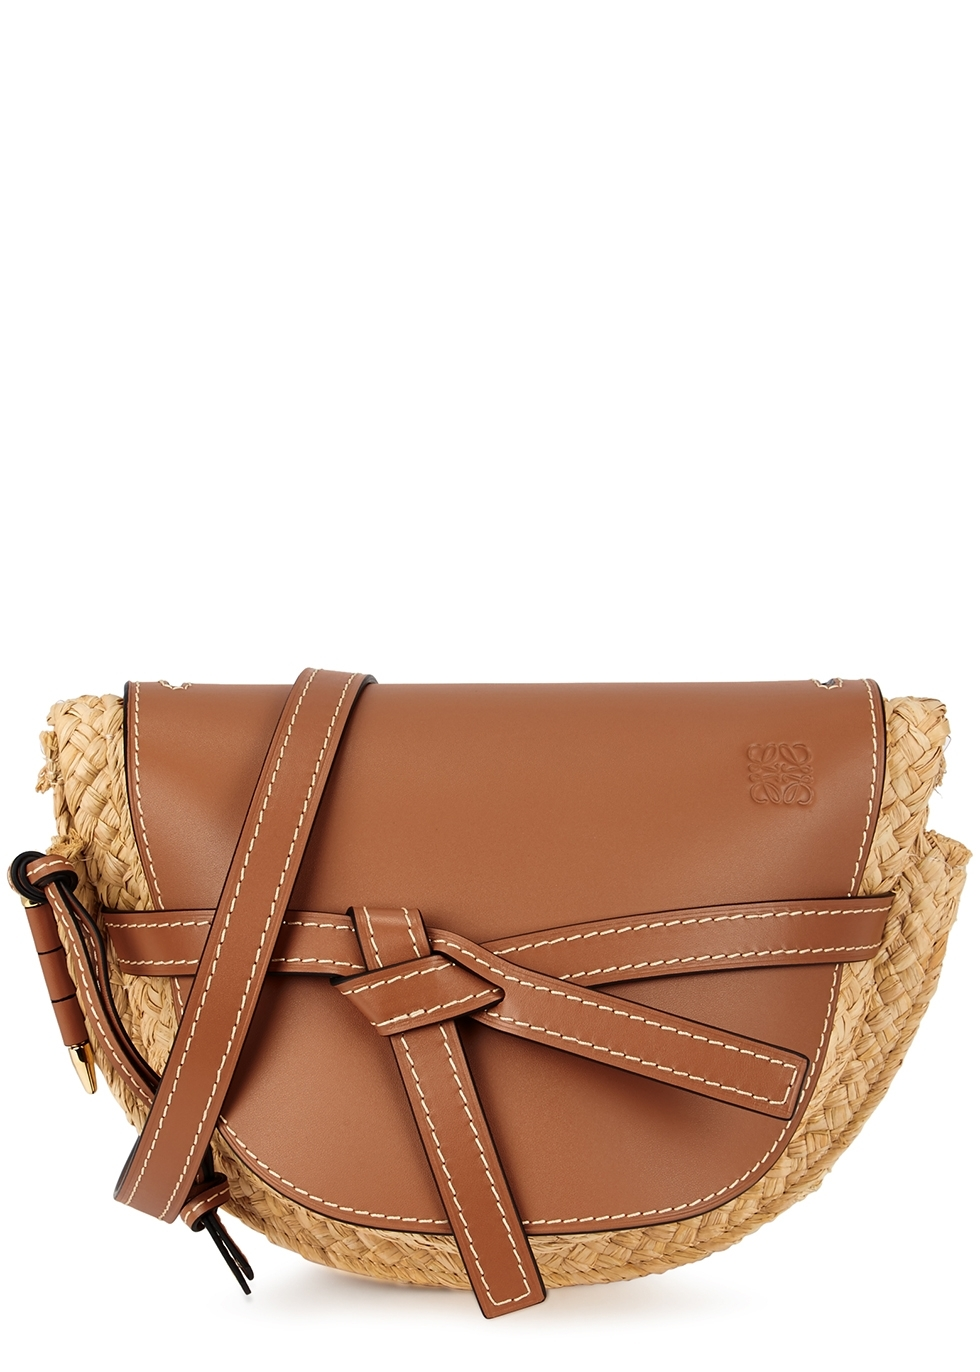 b34843427b5c Women s Designer Bags